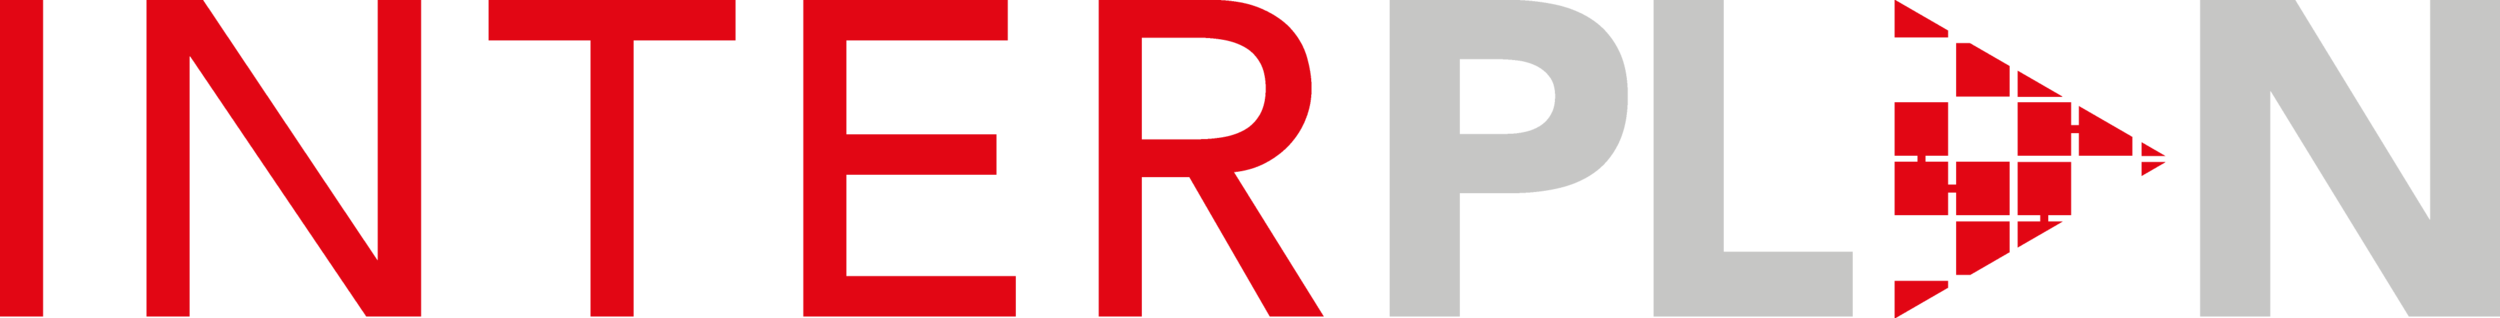 Interplan_Logo_small.png